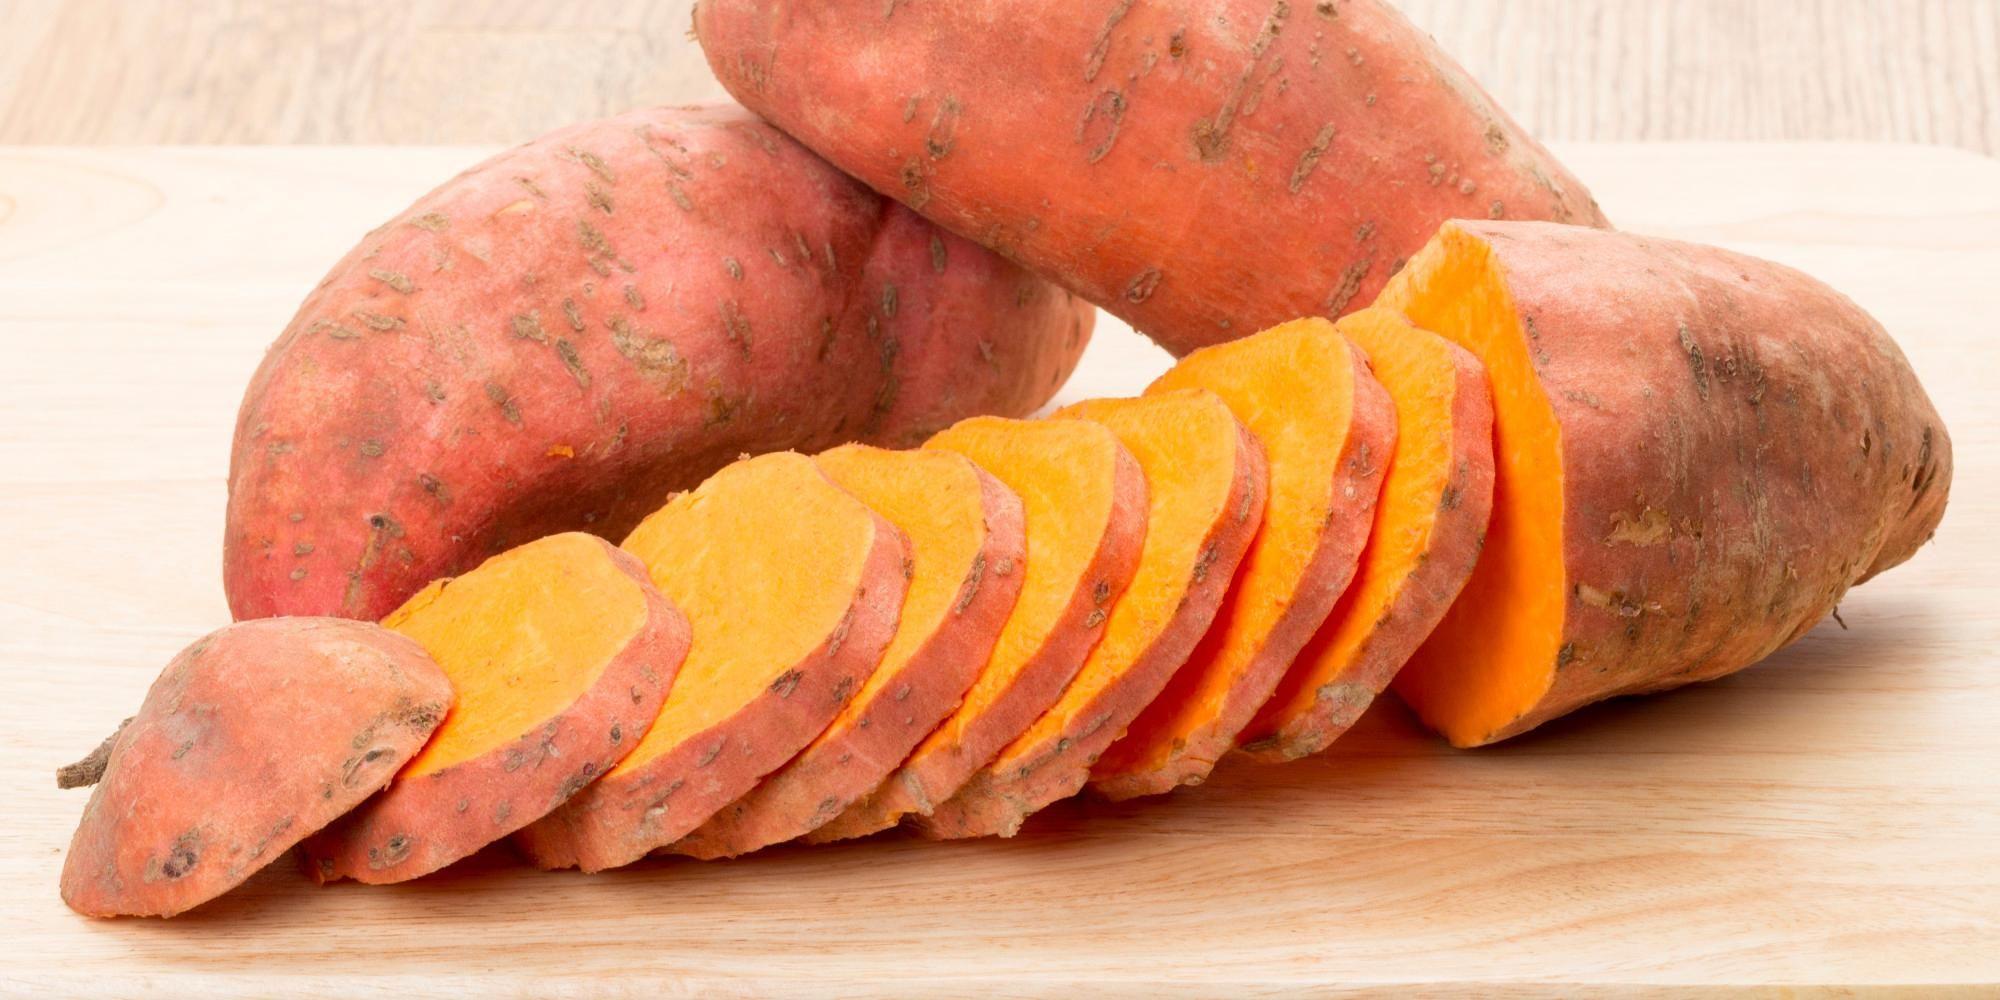 Sweet Potatoes And Diabetes 2